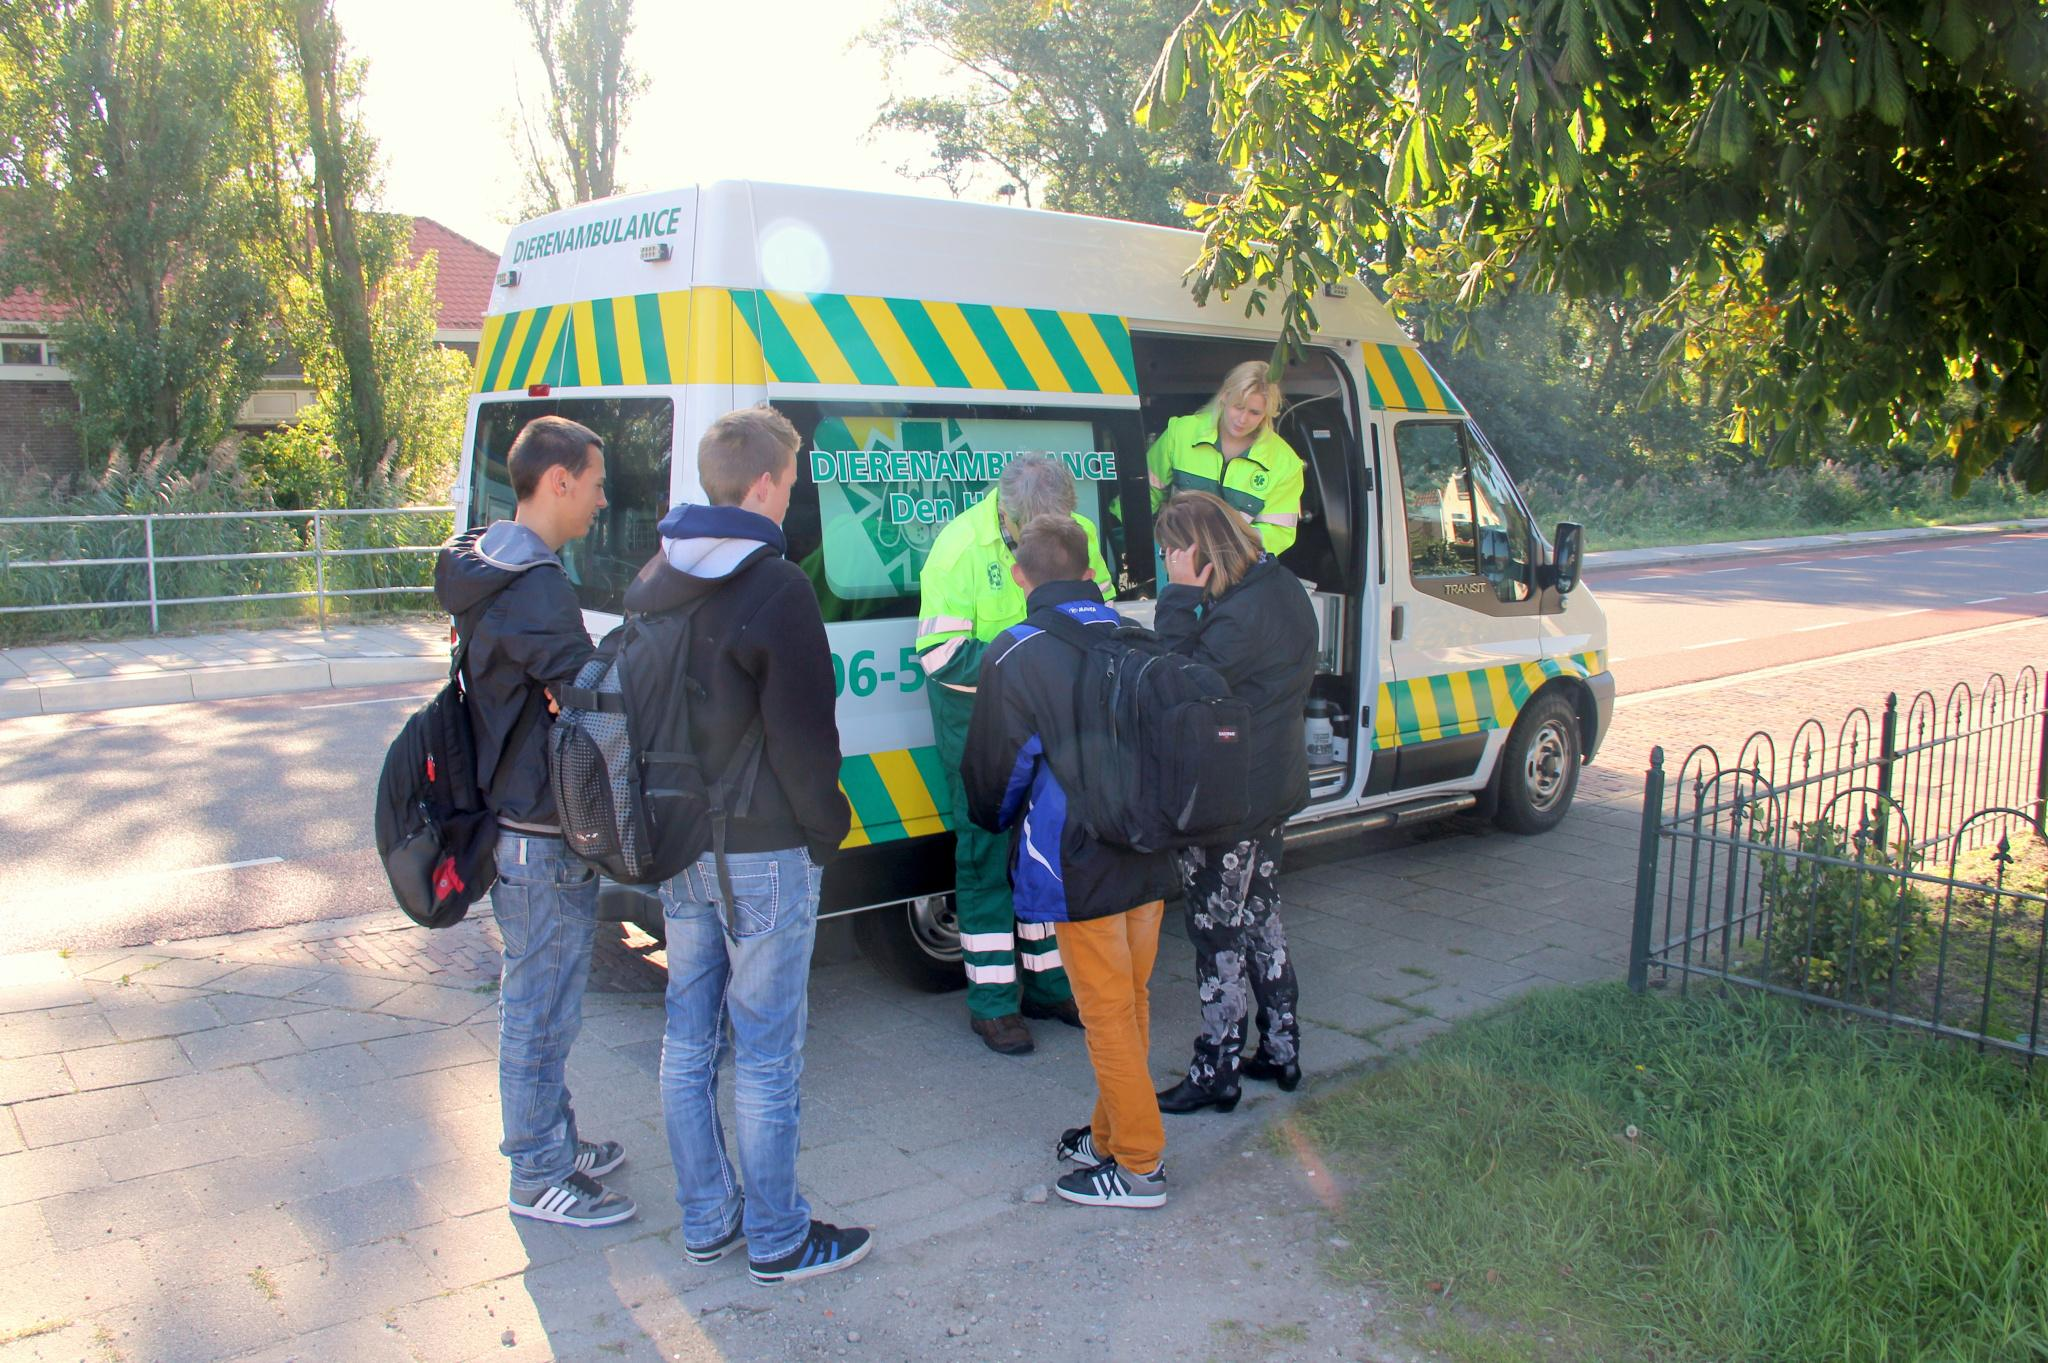 Sponsorloop met of zonder hond voor dierenambulance Den Helder-Hollands Kroon